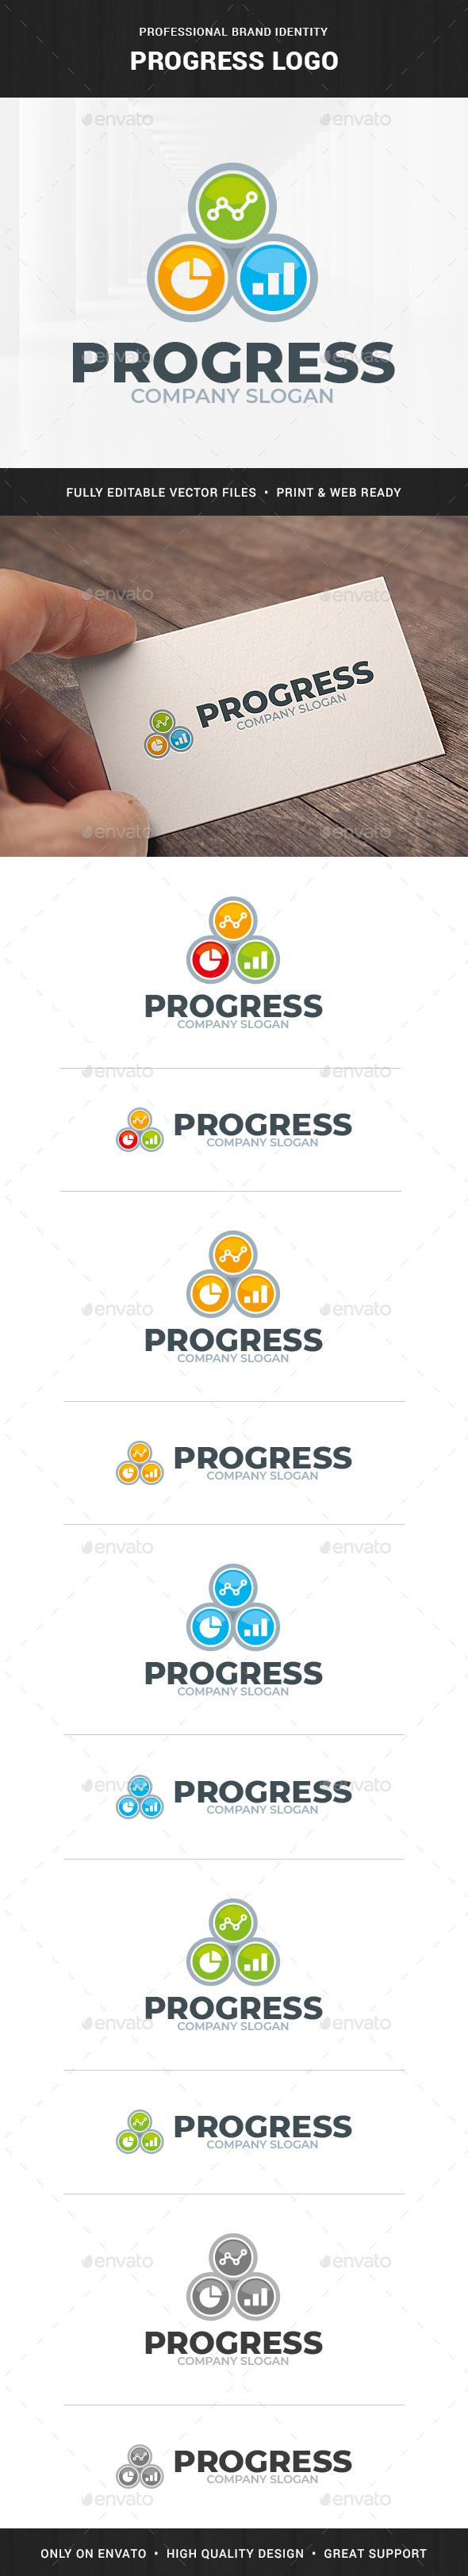 Progress Logo Template